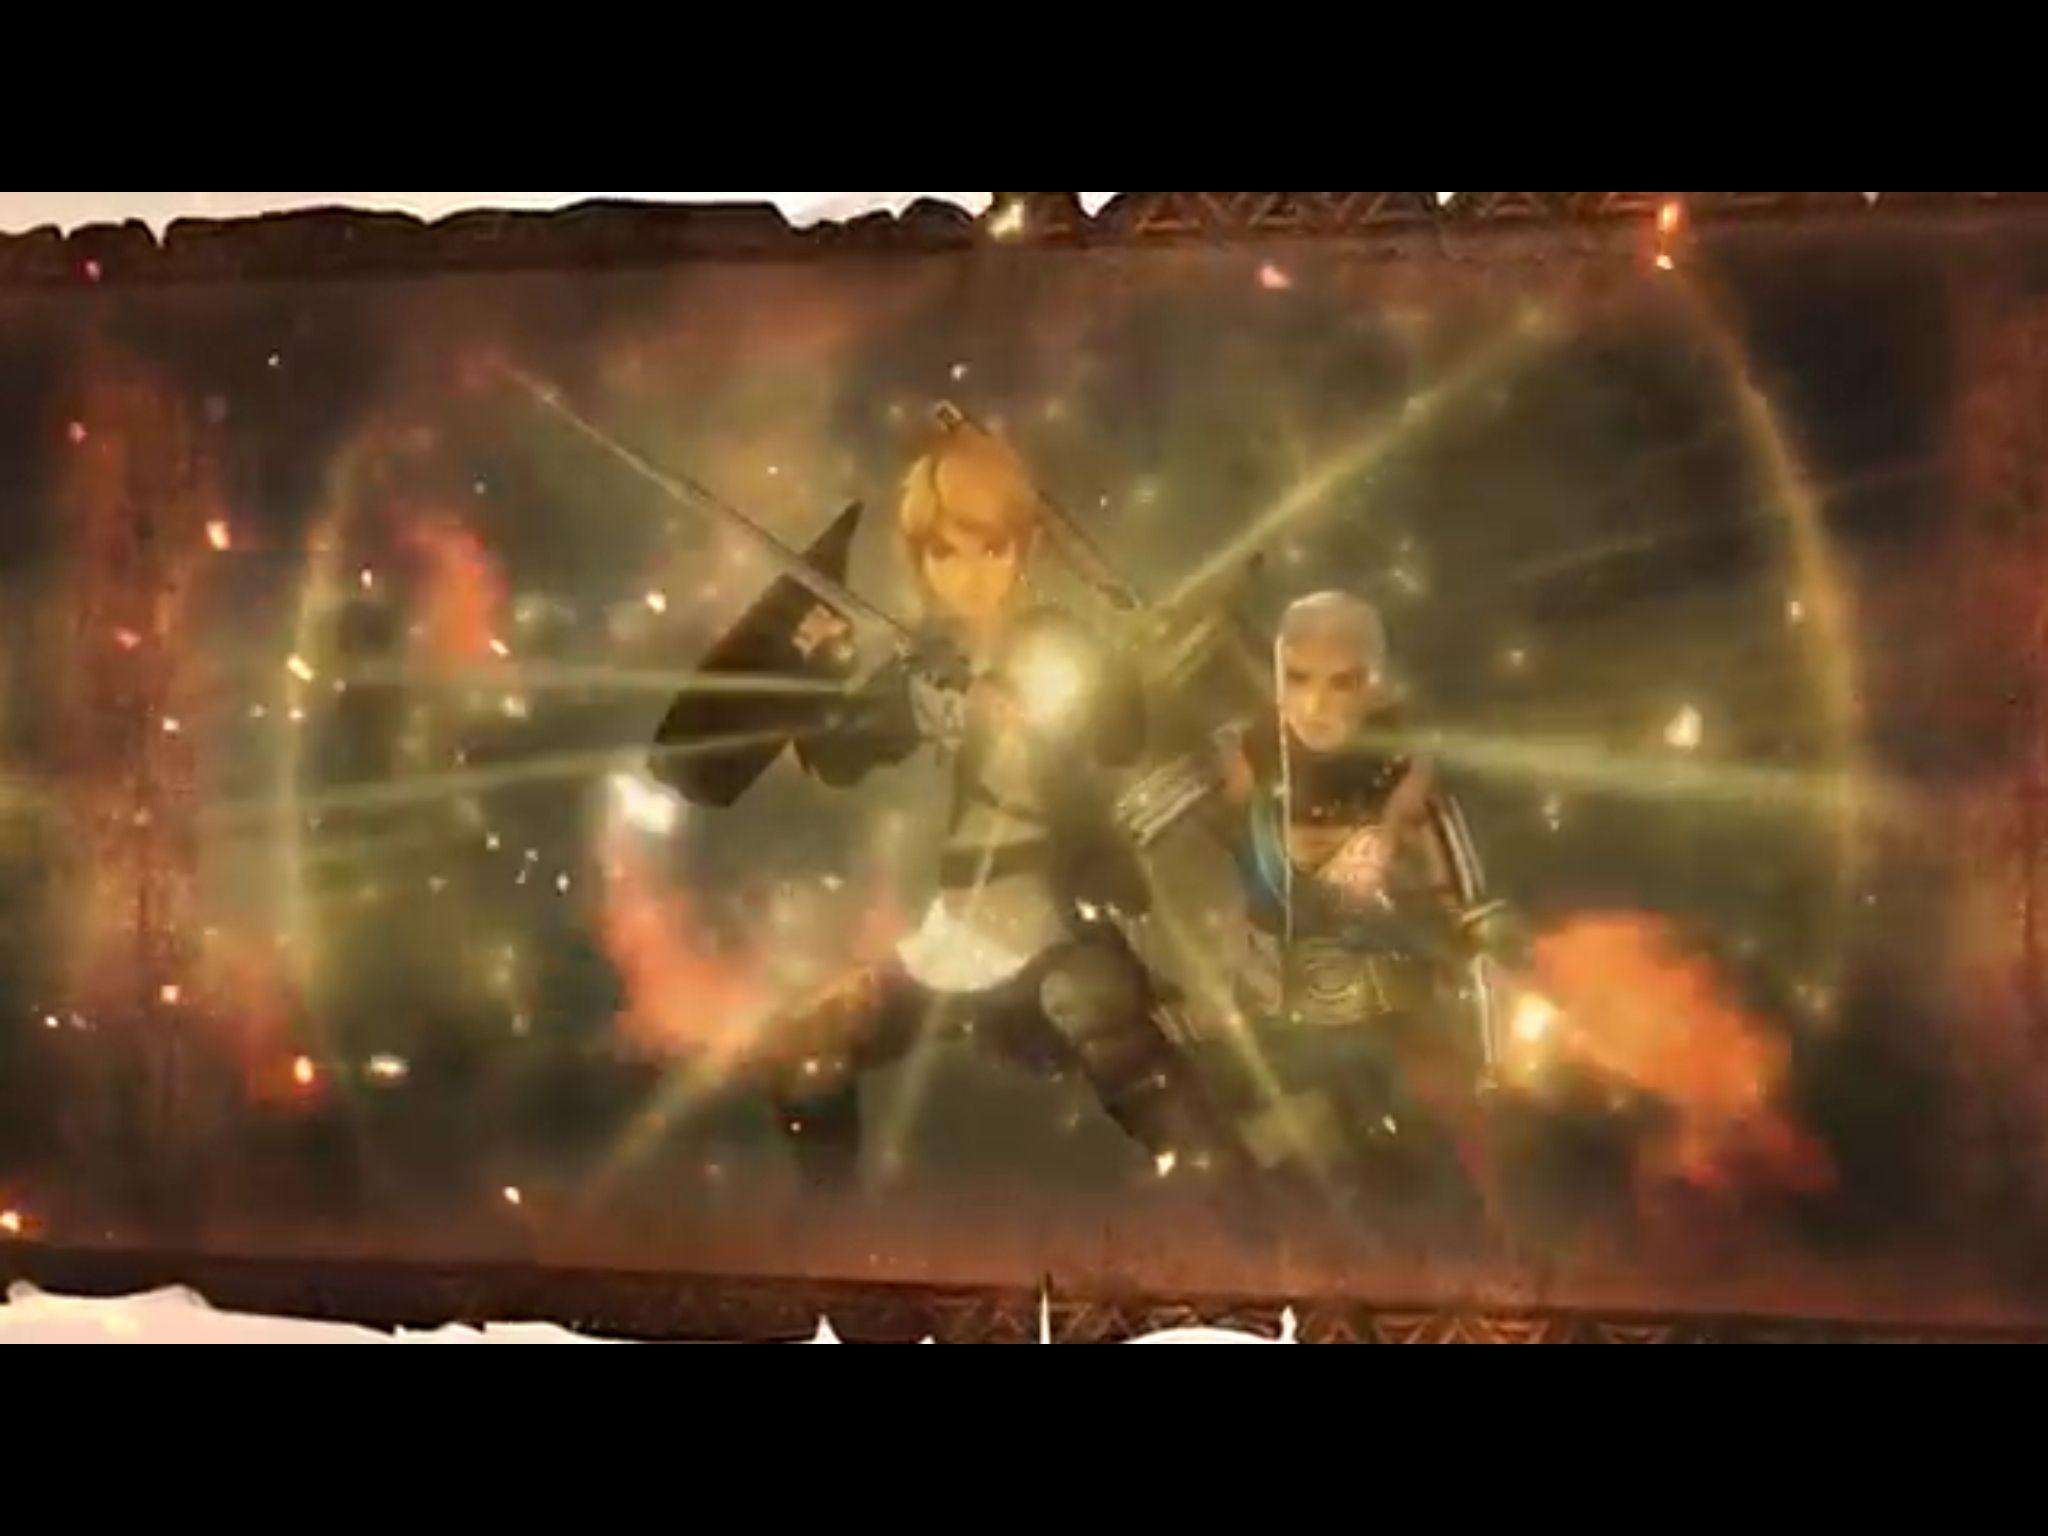 Hyrule Warriors Trailer Screenshots Hyrule warriors